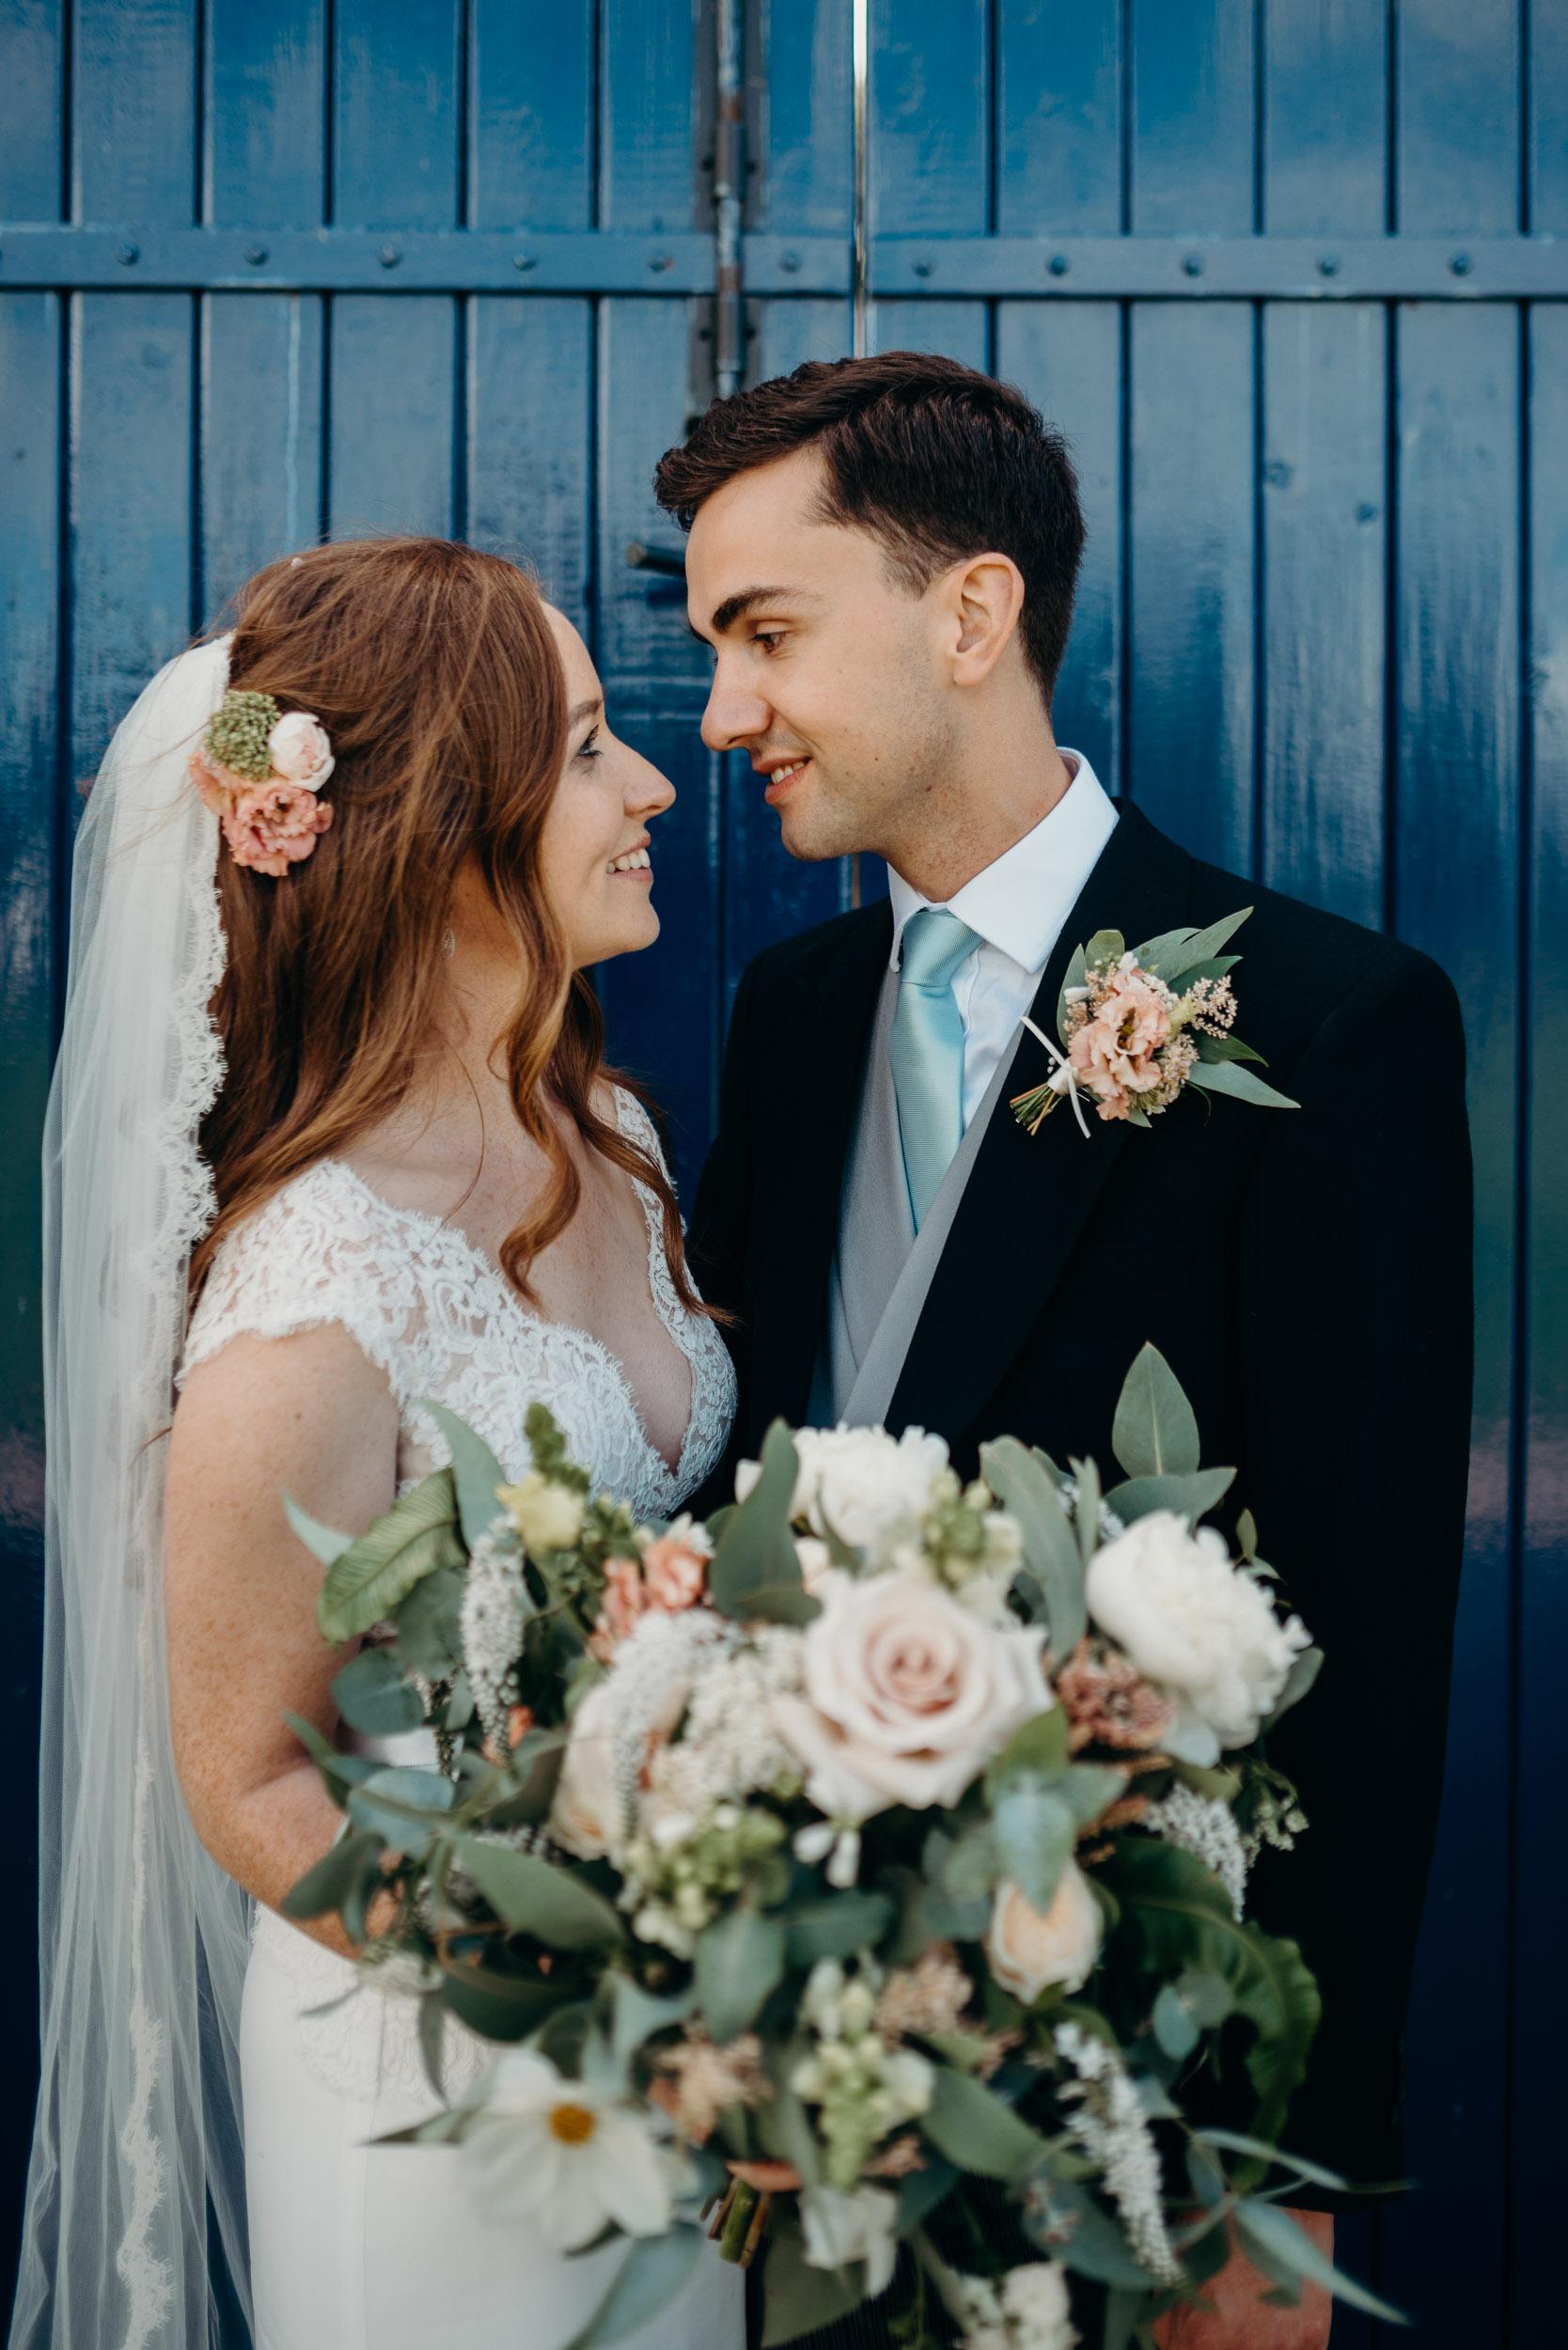 drenagh estate wedding photography-85.jpg